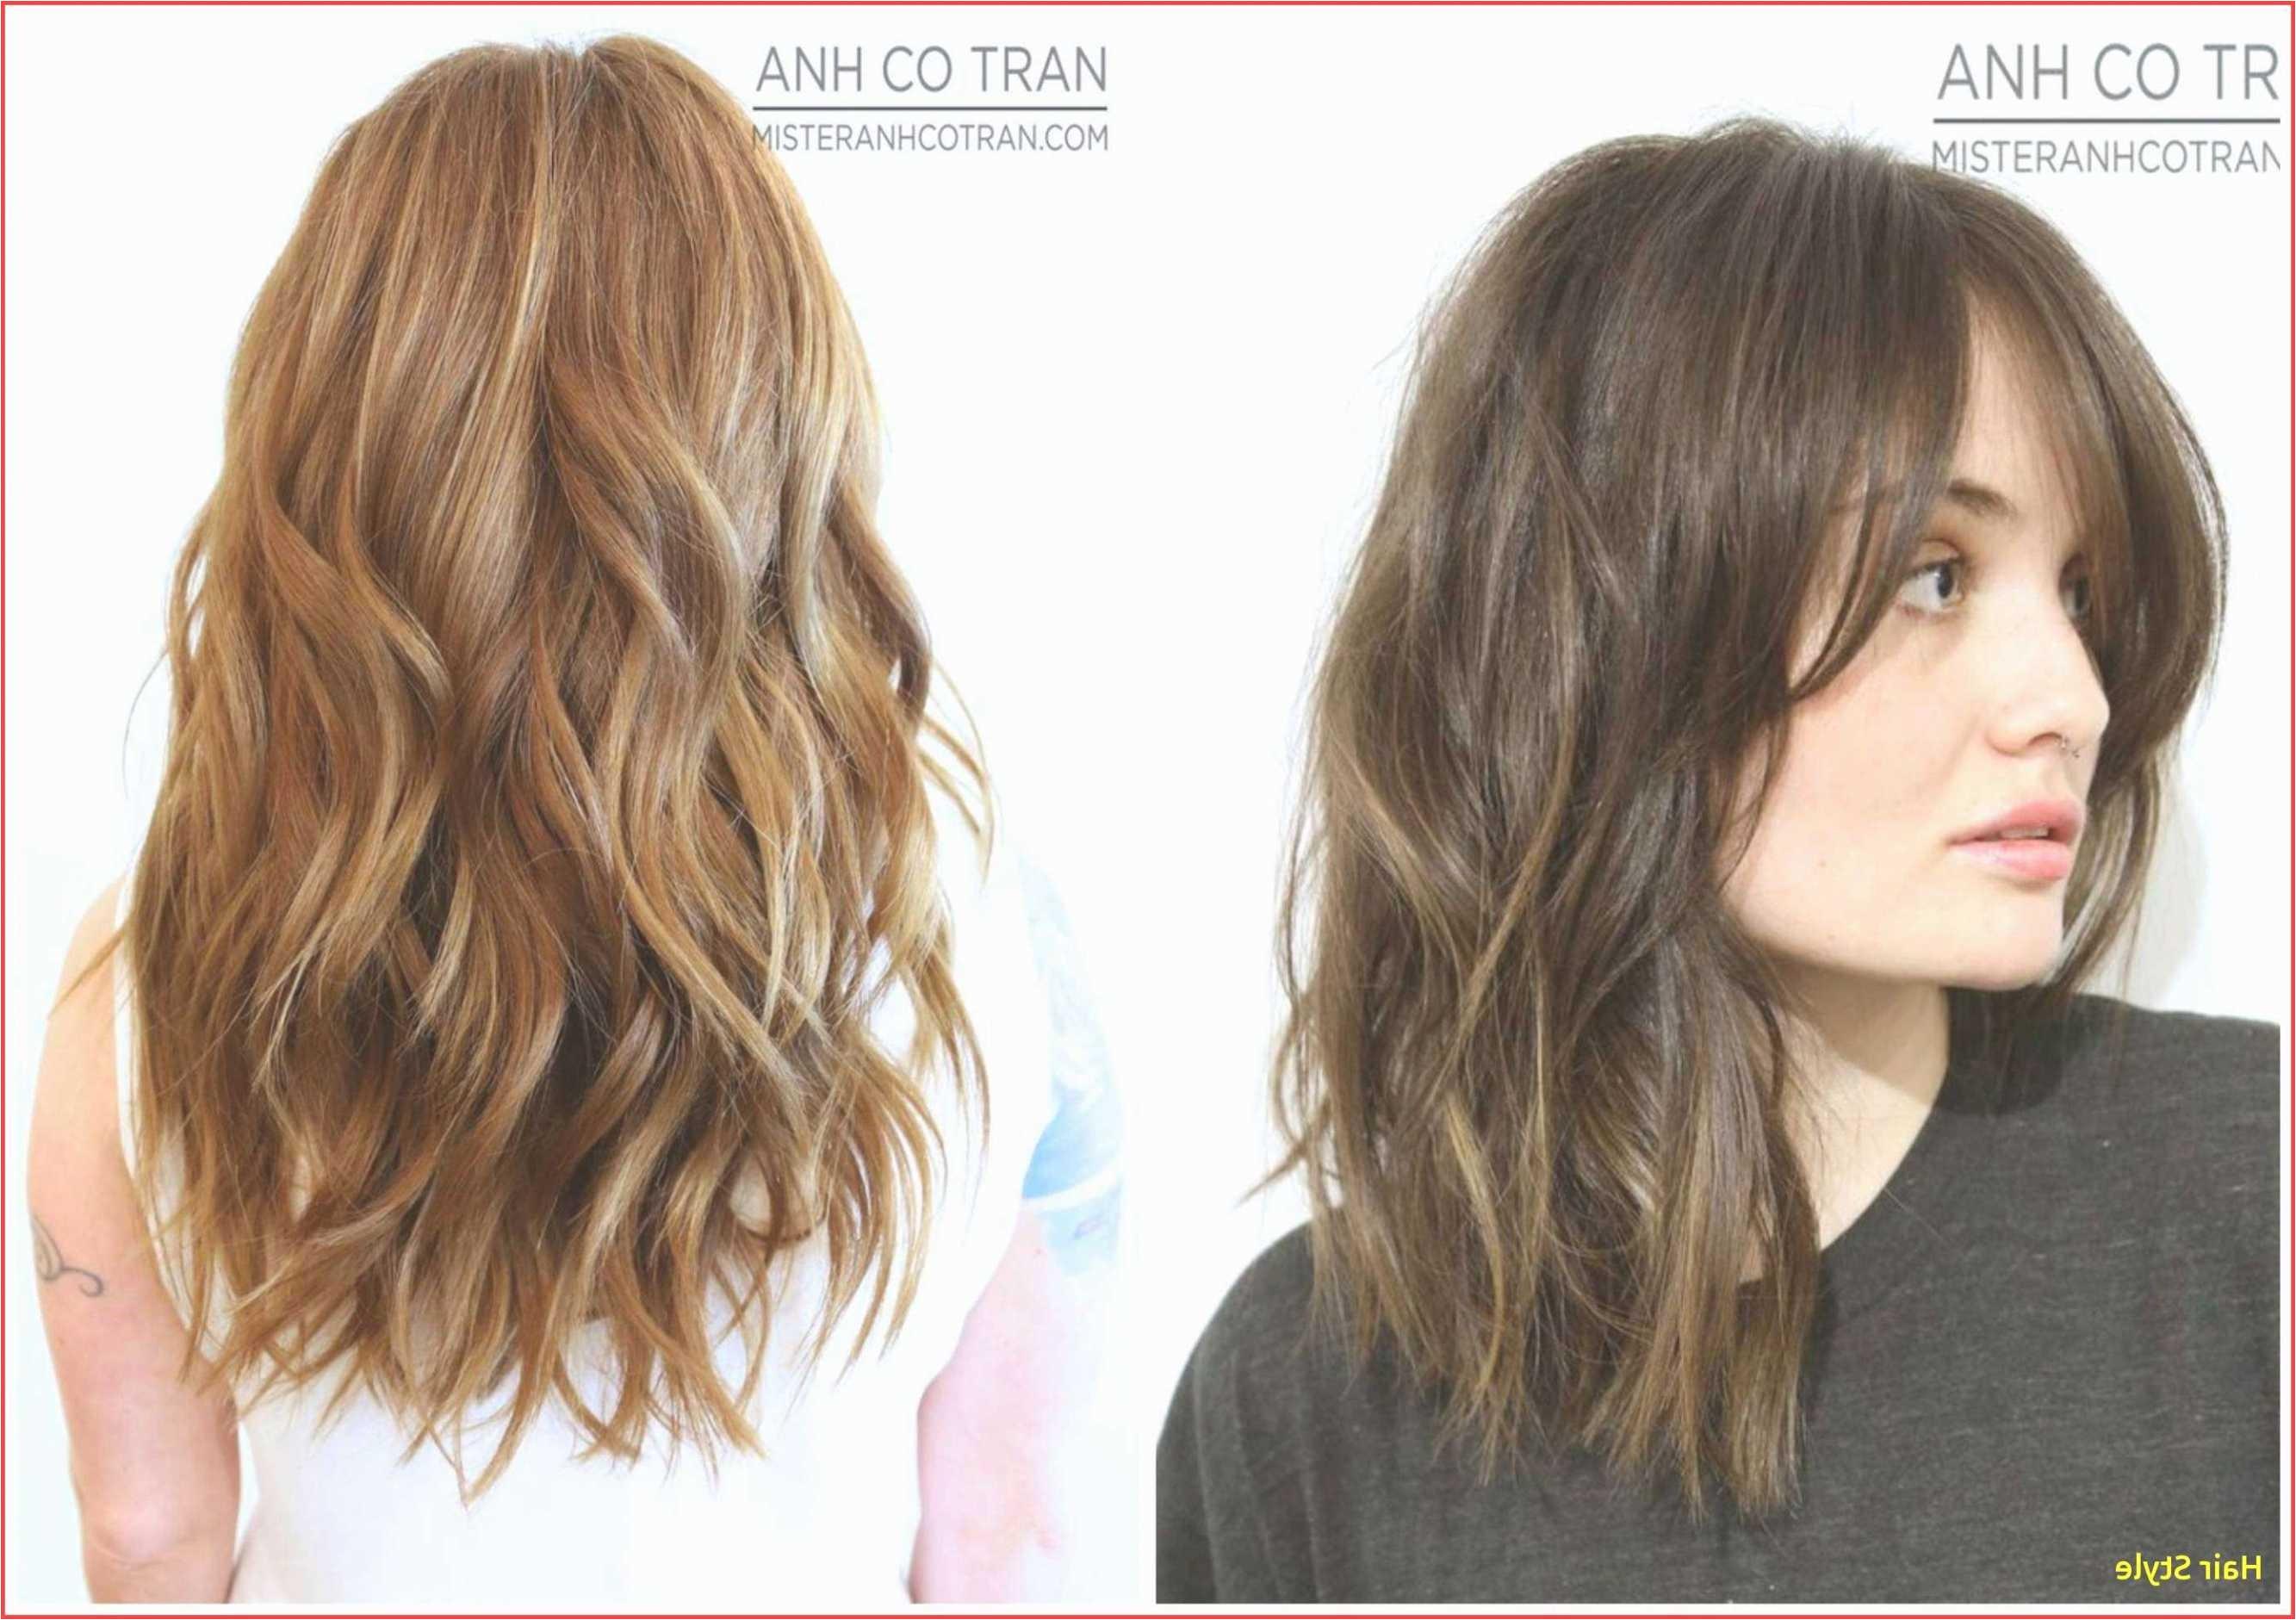 Asian Short Hair Styles Awesome New Short Wavy asian Hairstyles – Uternity